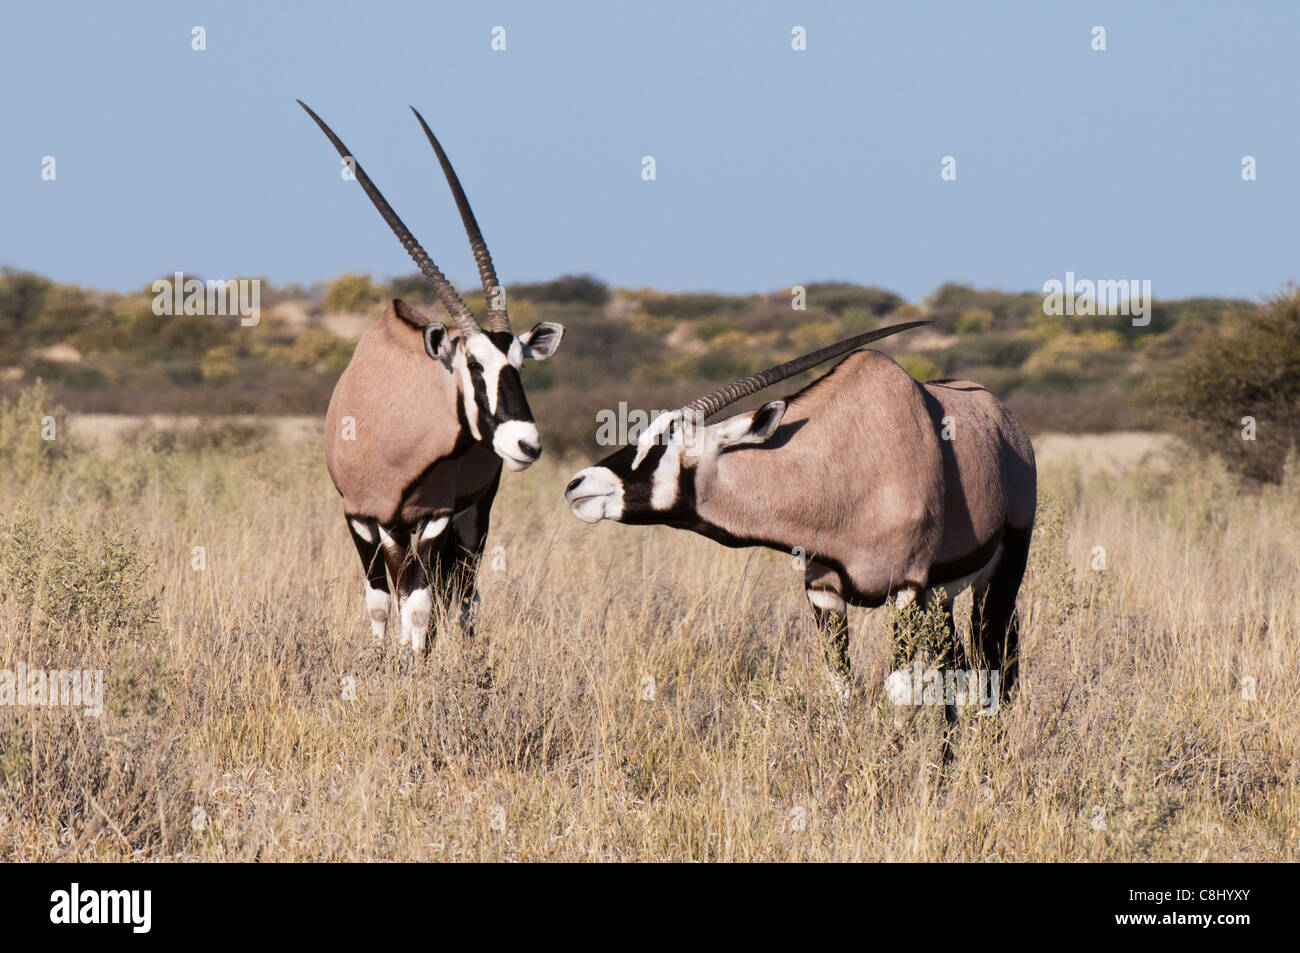 Gemsbok (Oryx gazella), Deception Valley, Central Kalahari Game Reserve, Botswana. - Stock Image